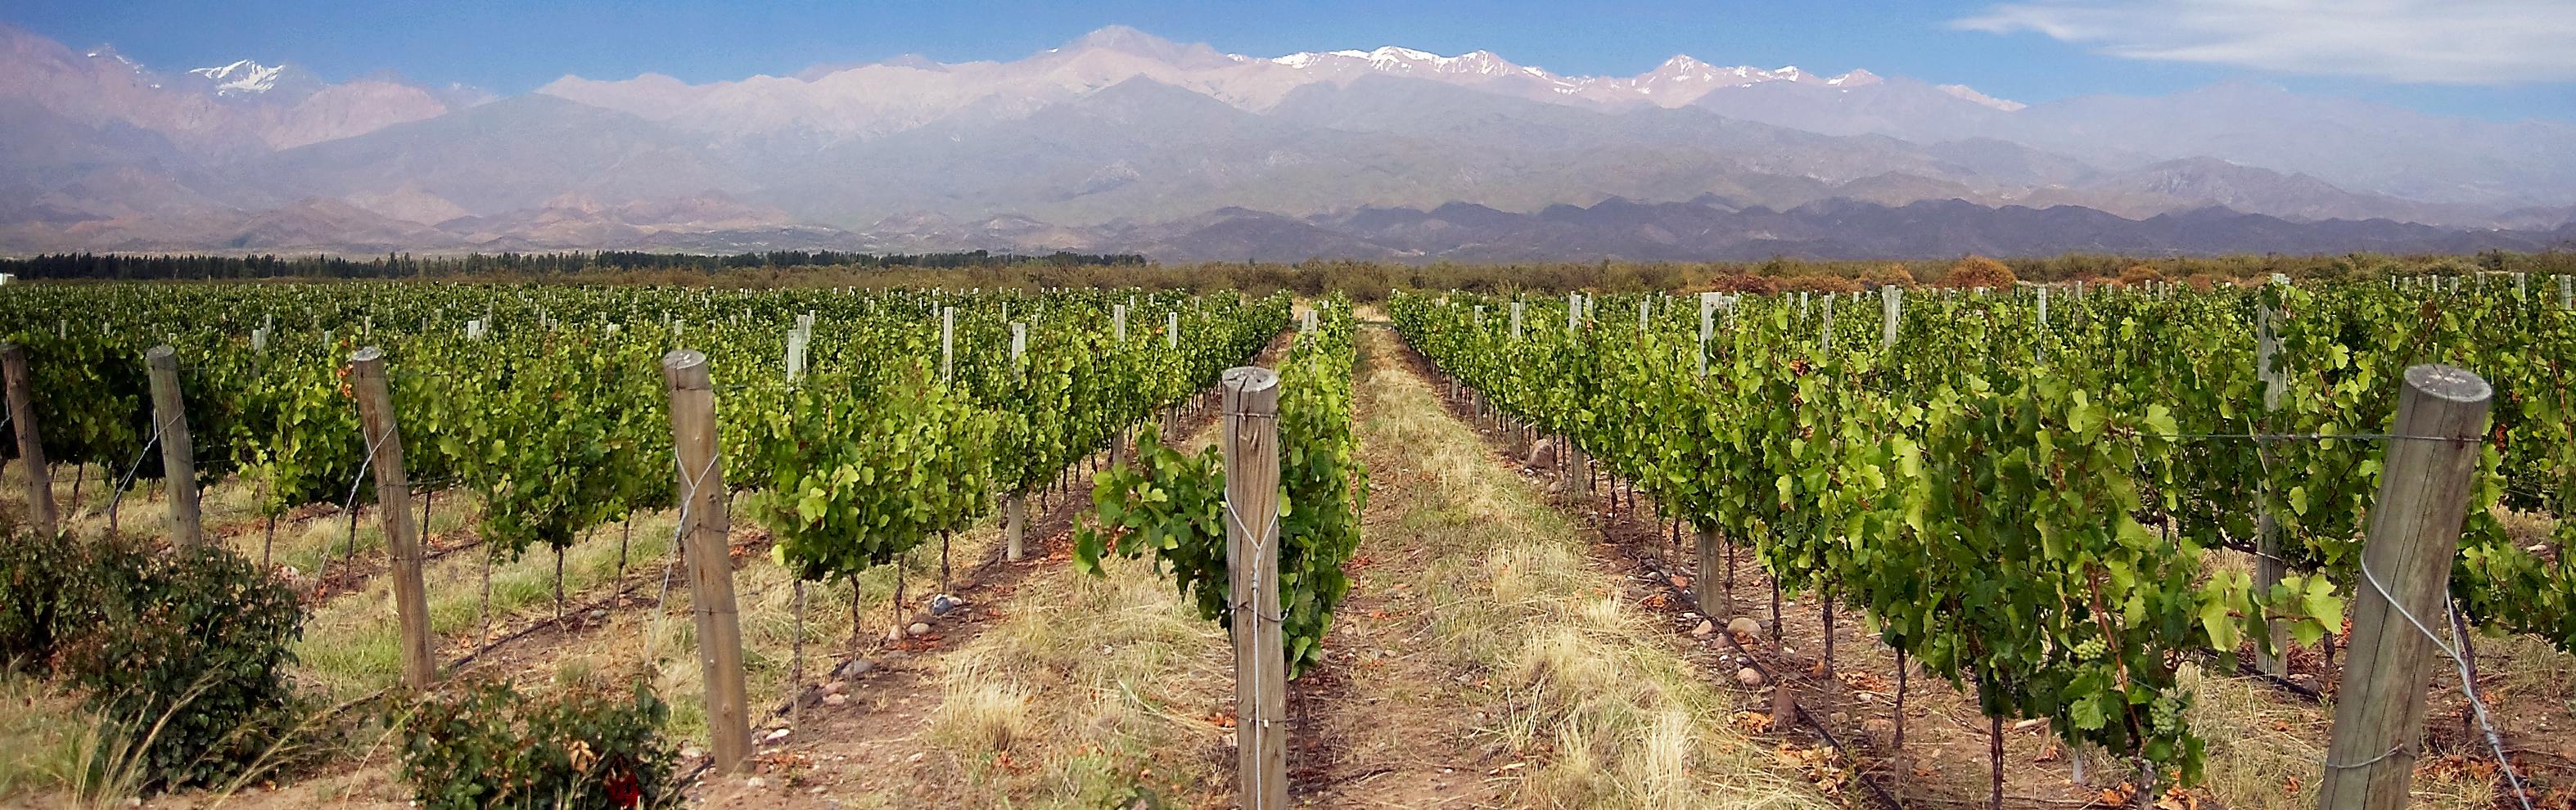 Vineyard under the Andes.